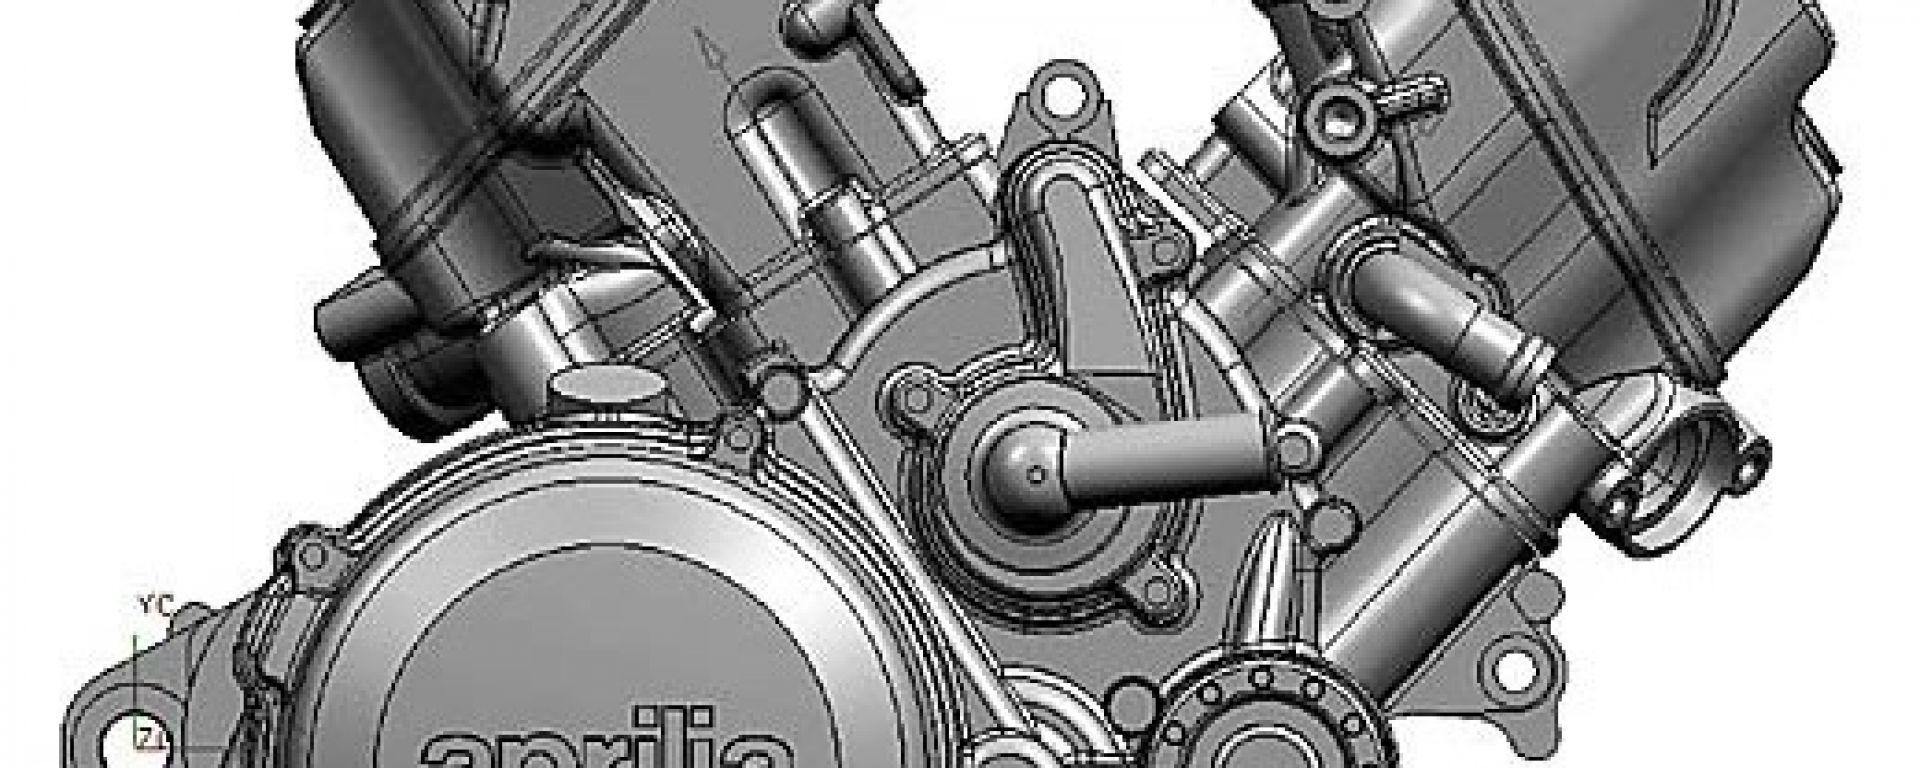 Aprilia motore 45.2